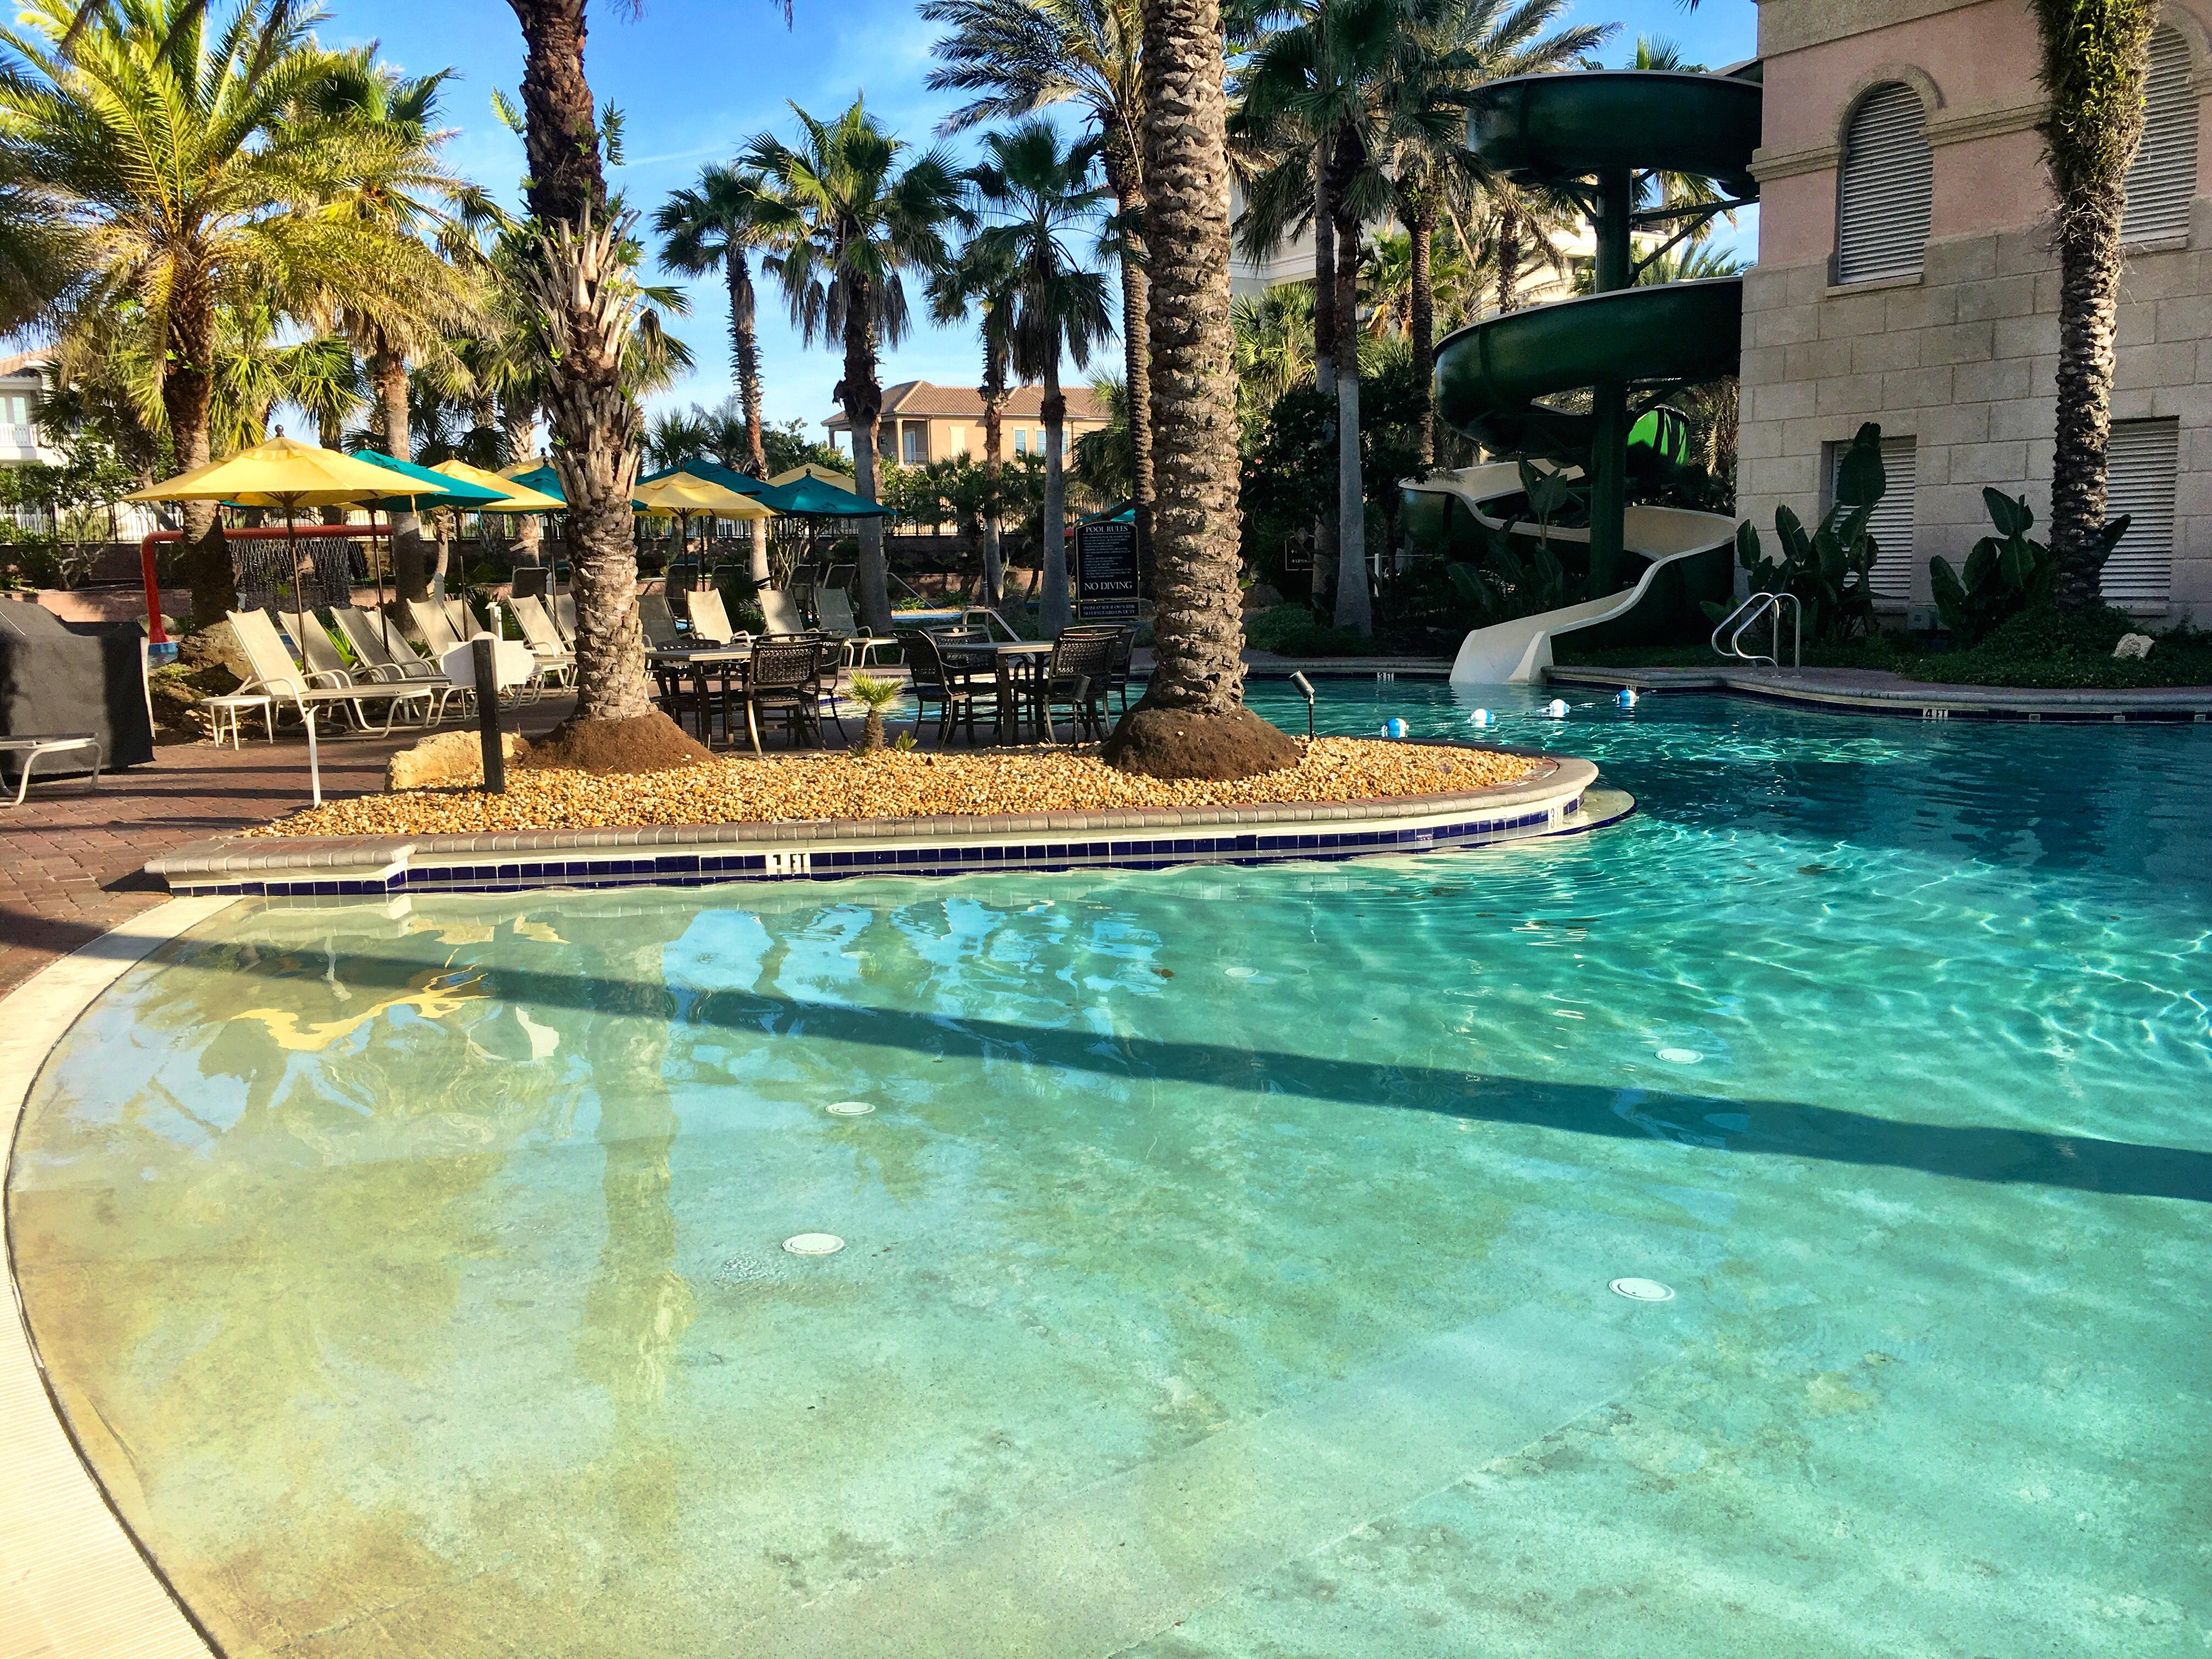 Main Pool at Hammock Beach Resort